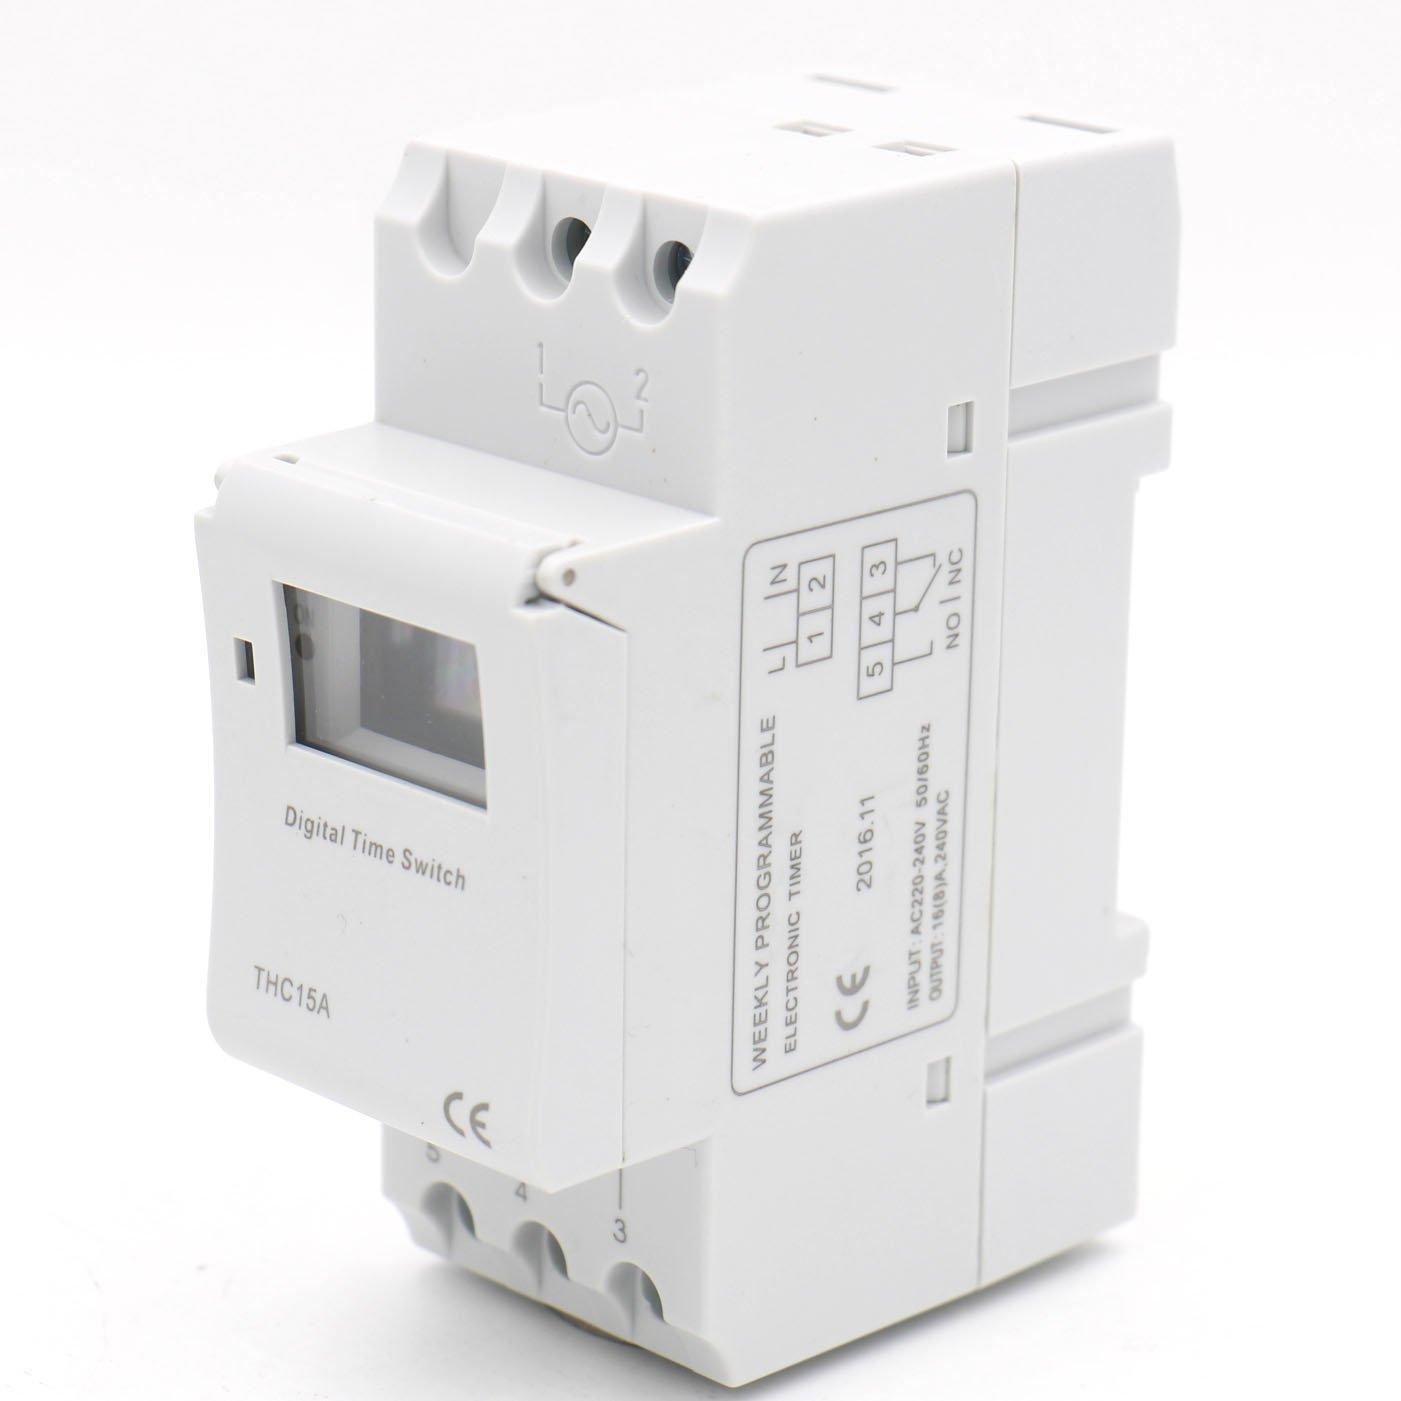 Baomain thc15a ac 220v 240v digital lcd power programmable timer baomain thc15a ac 220v 240v digital lcd power programmable timer time switch relay 16a amp amazon malvernweather Images